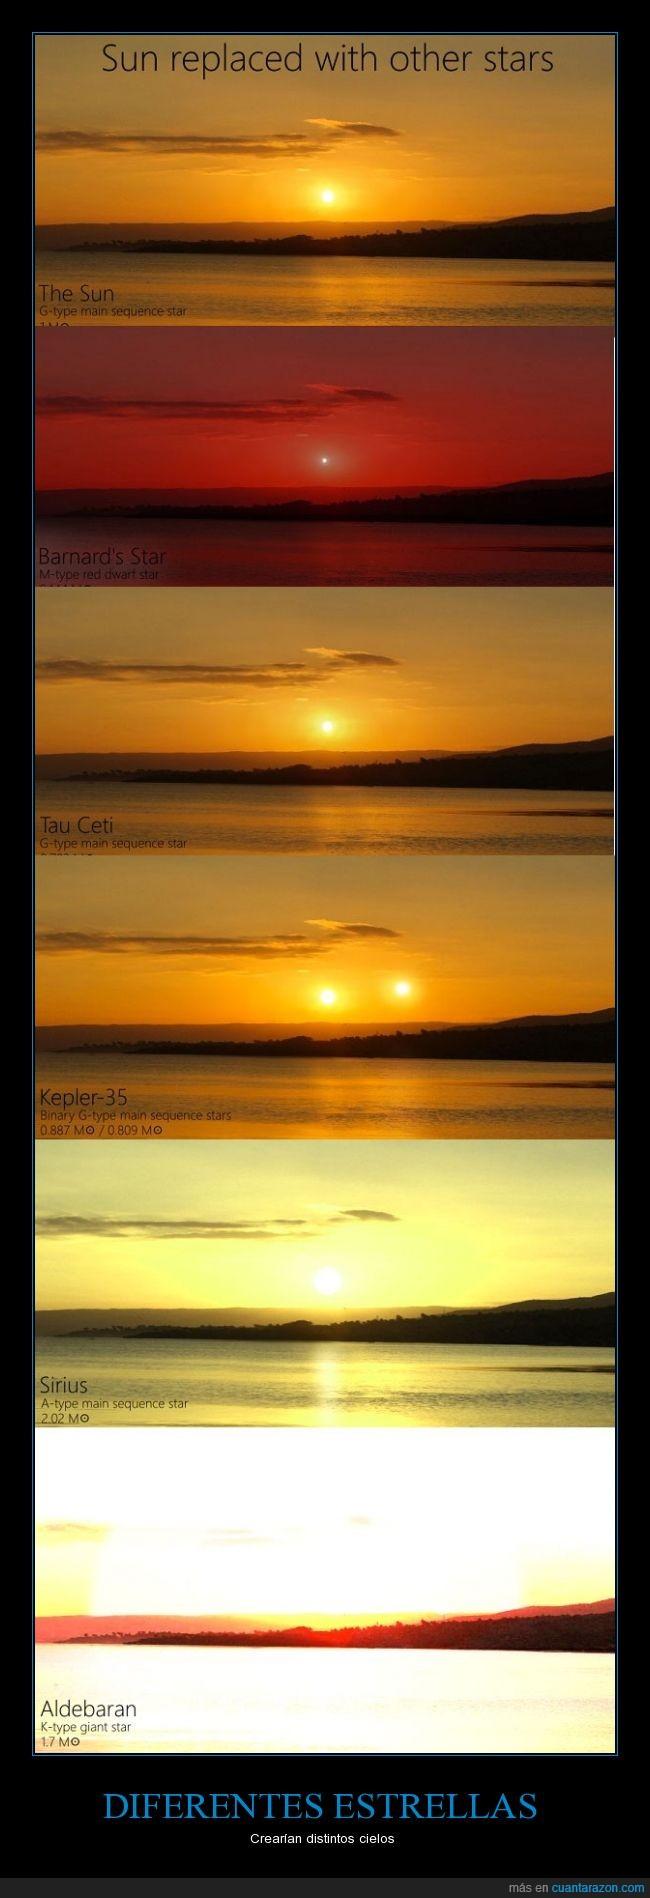 Aldebaran,Barnard,cielo,estrella,kepler 35,luz,Sirius,sol,Tau ceti